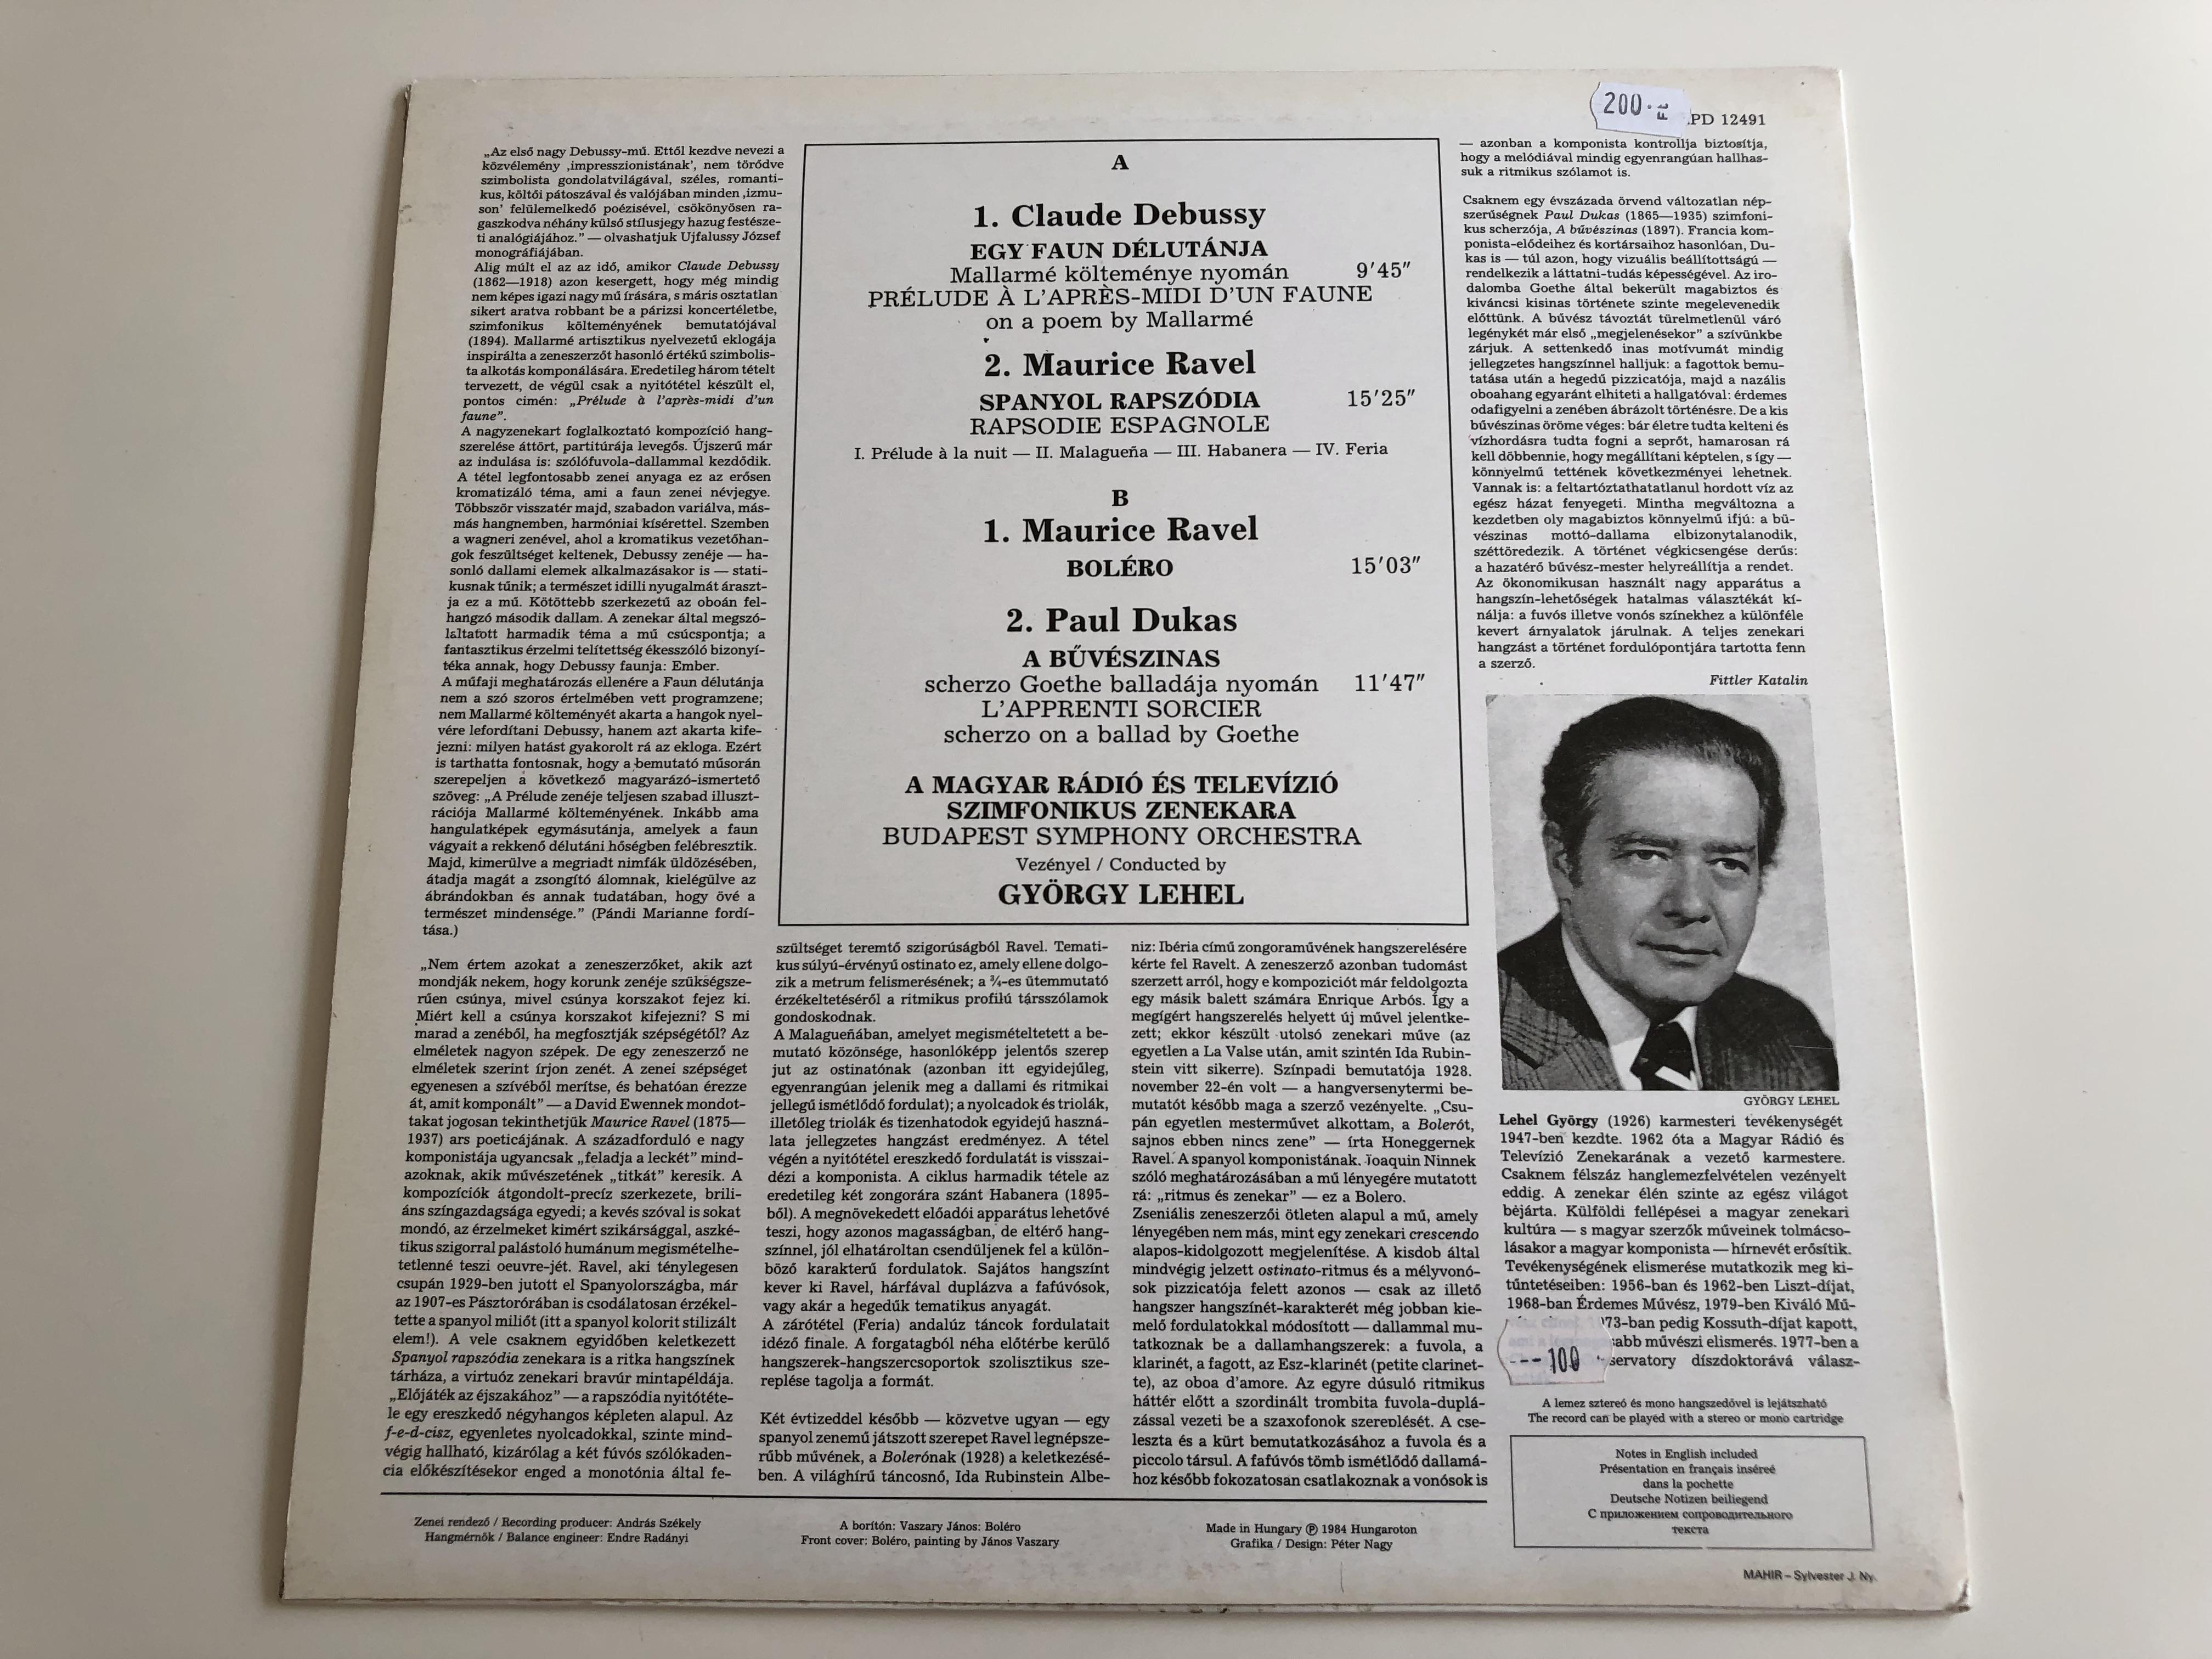 bolero-debussy-pr-lude-l-apr-s-midi-d-un-faune-ravel-rapsodie-espanole-bolero-dukas-l-apprenti-sorcier-budapest-symphony-orchestra-gy-rgy-lehel-hungaroton-lp-s.jpg